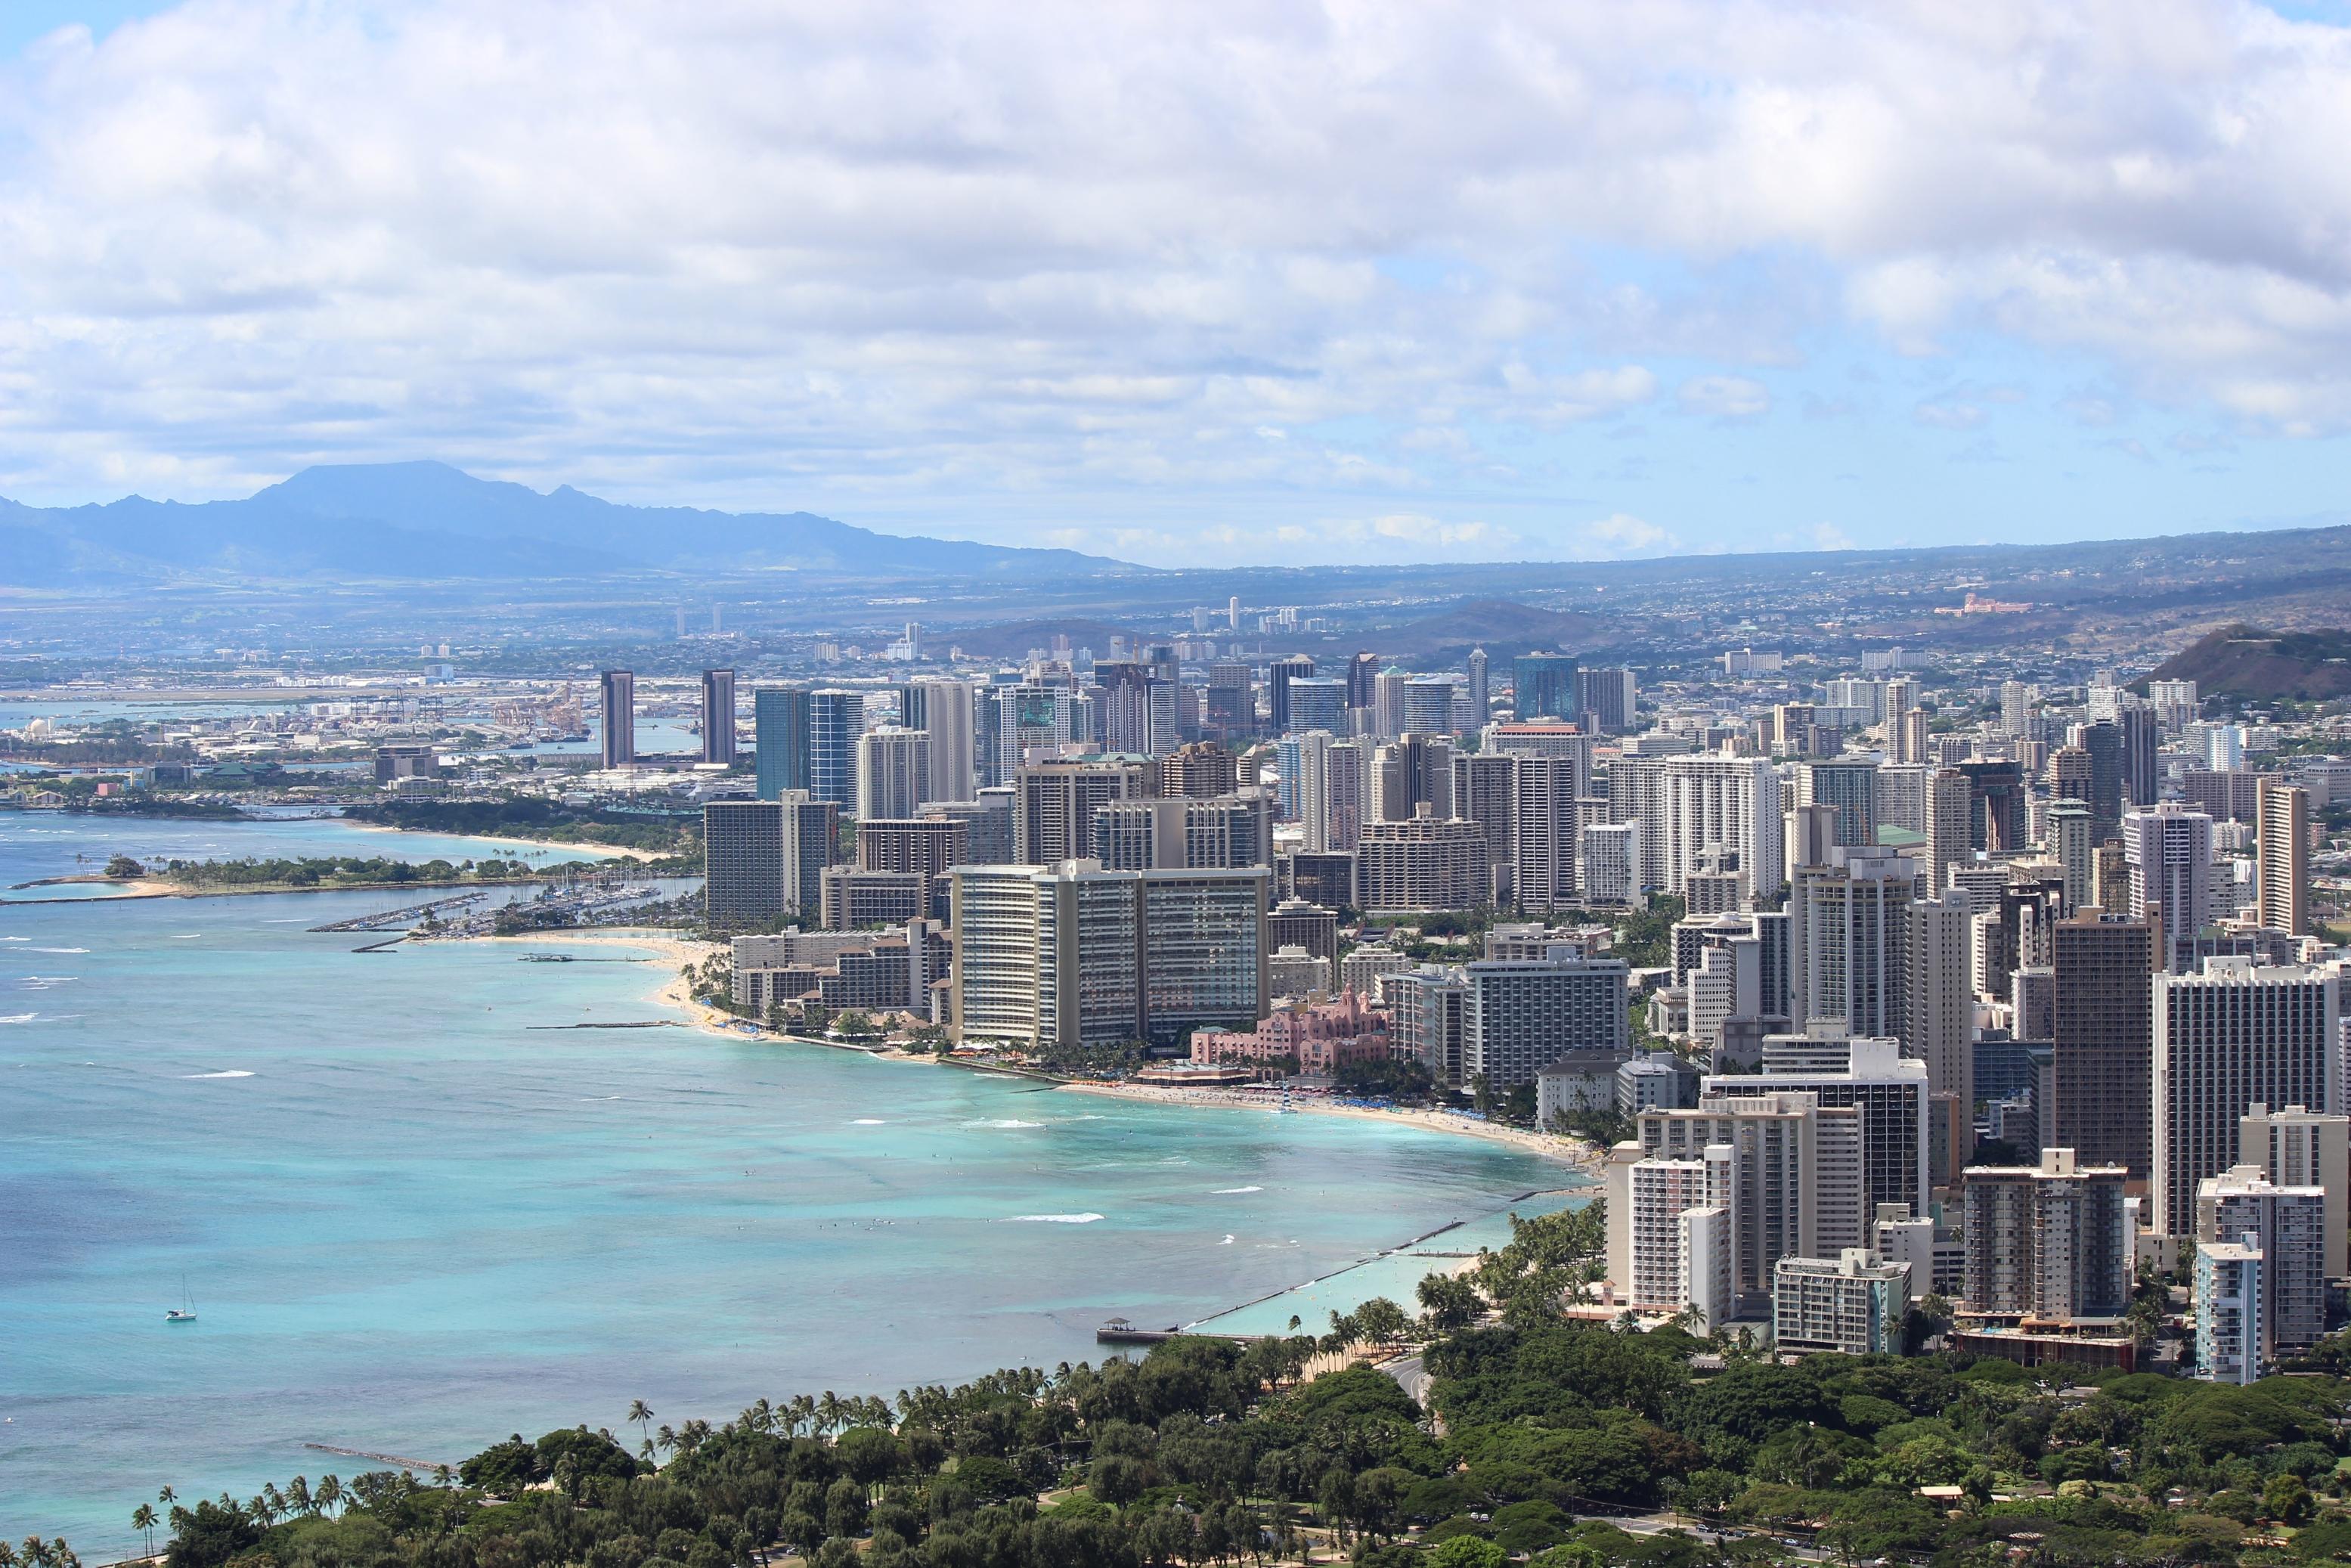 View of Waikiki from Diamondhead